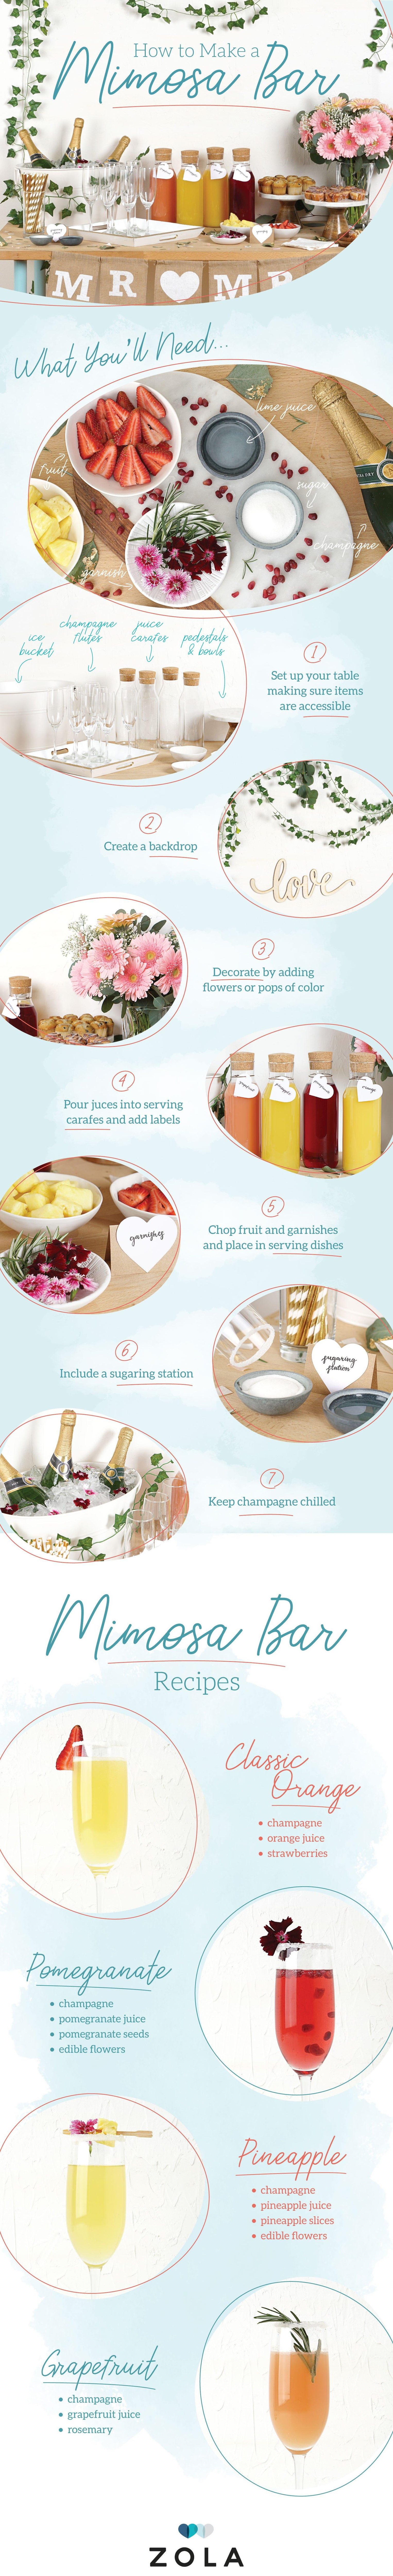 zola-mimosa-bar-1